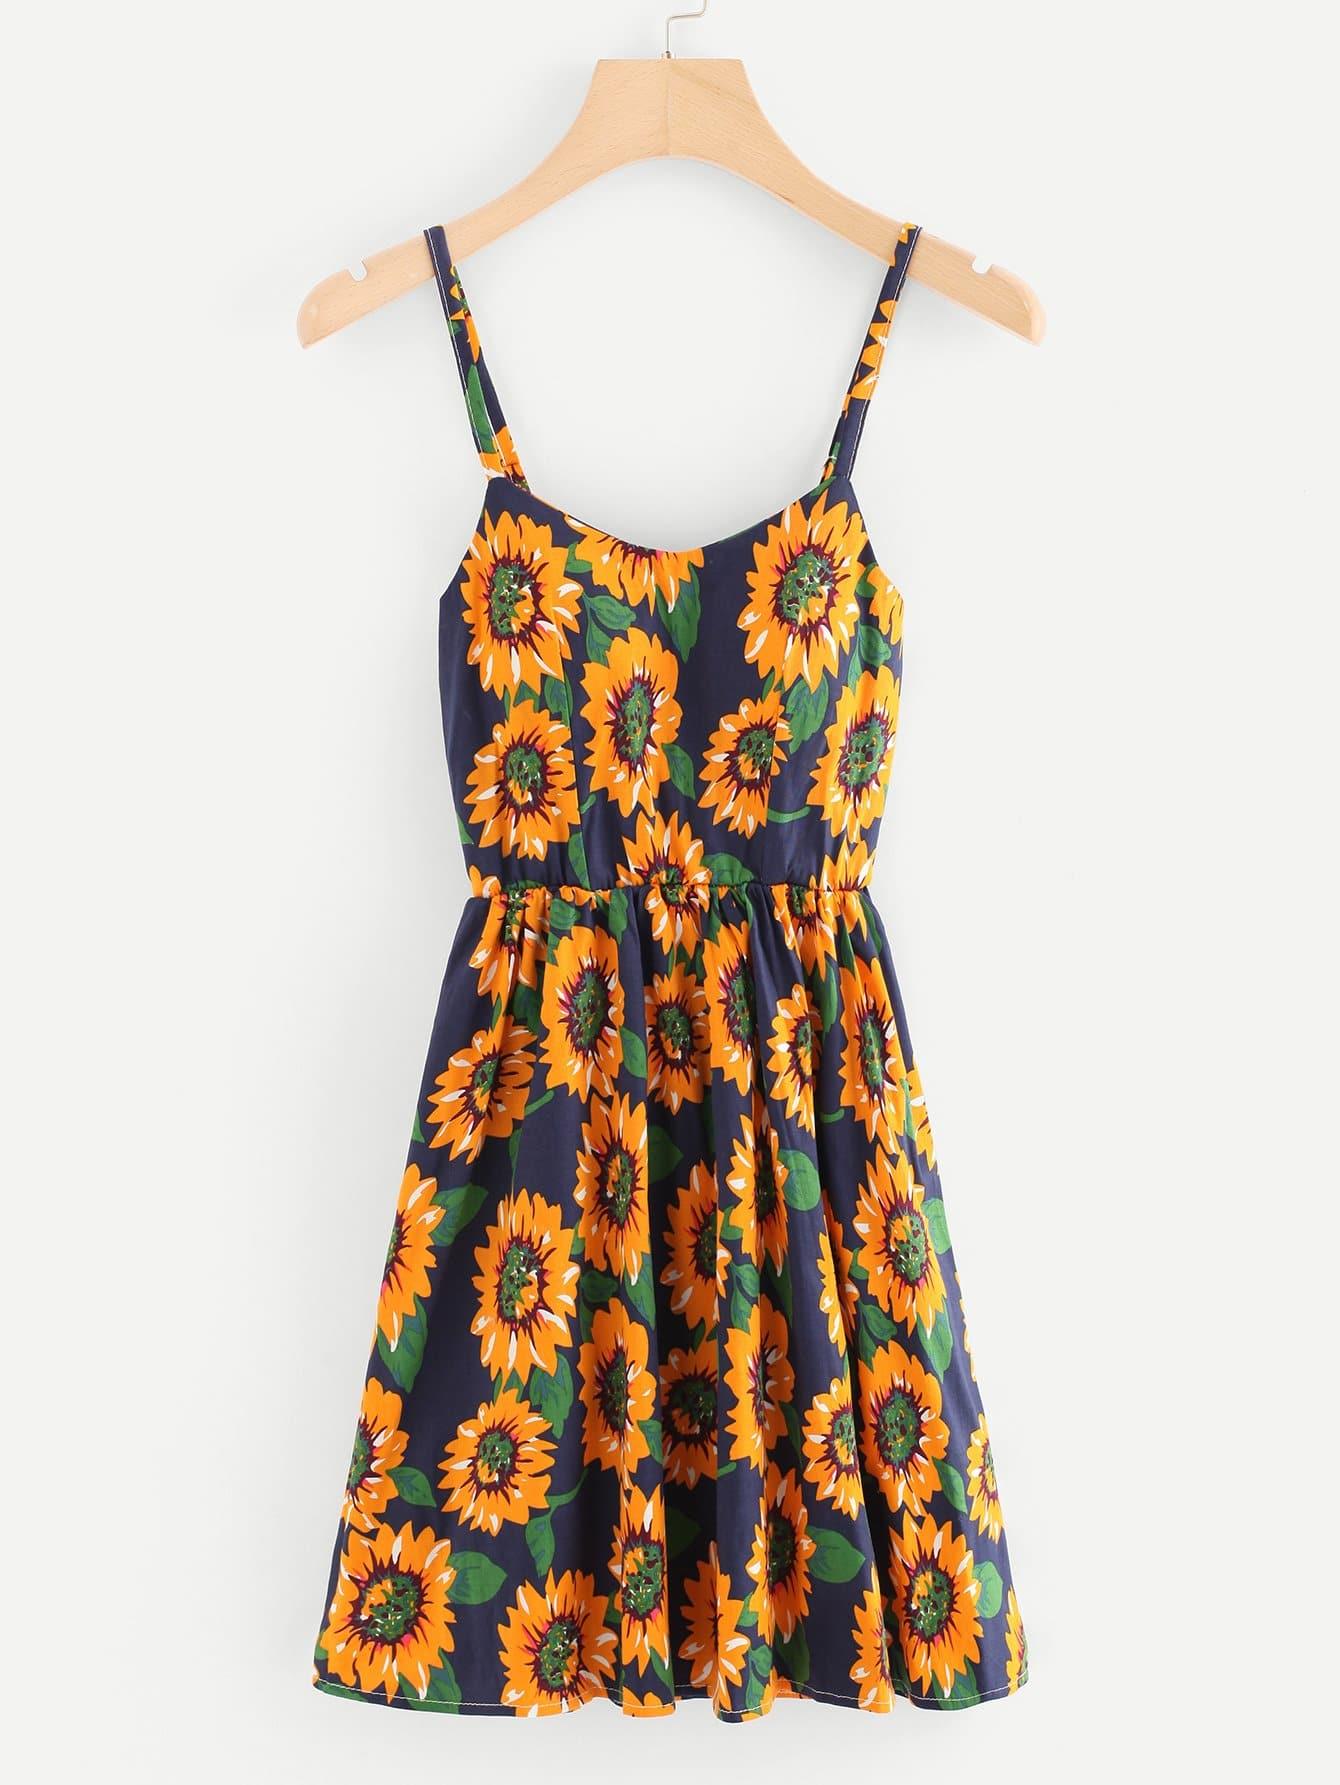 Random Sunflower Print Lace Up Back Cami Dress